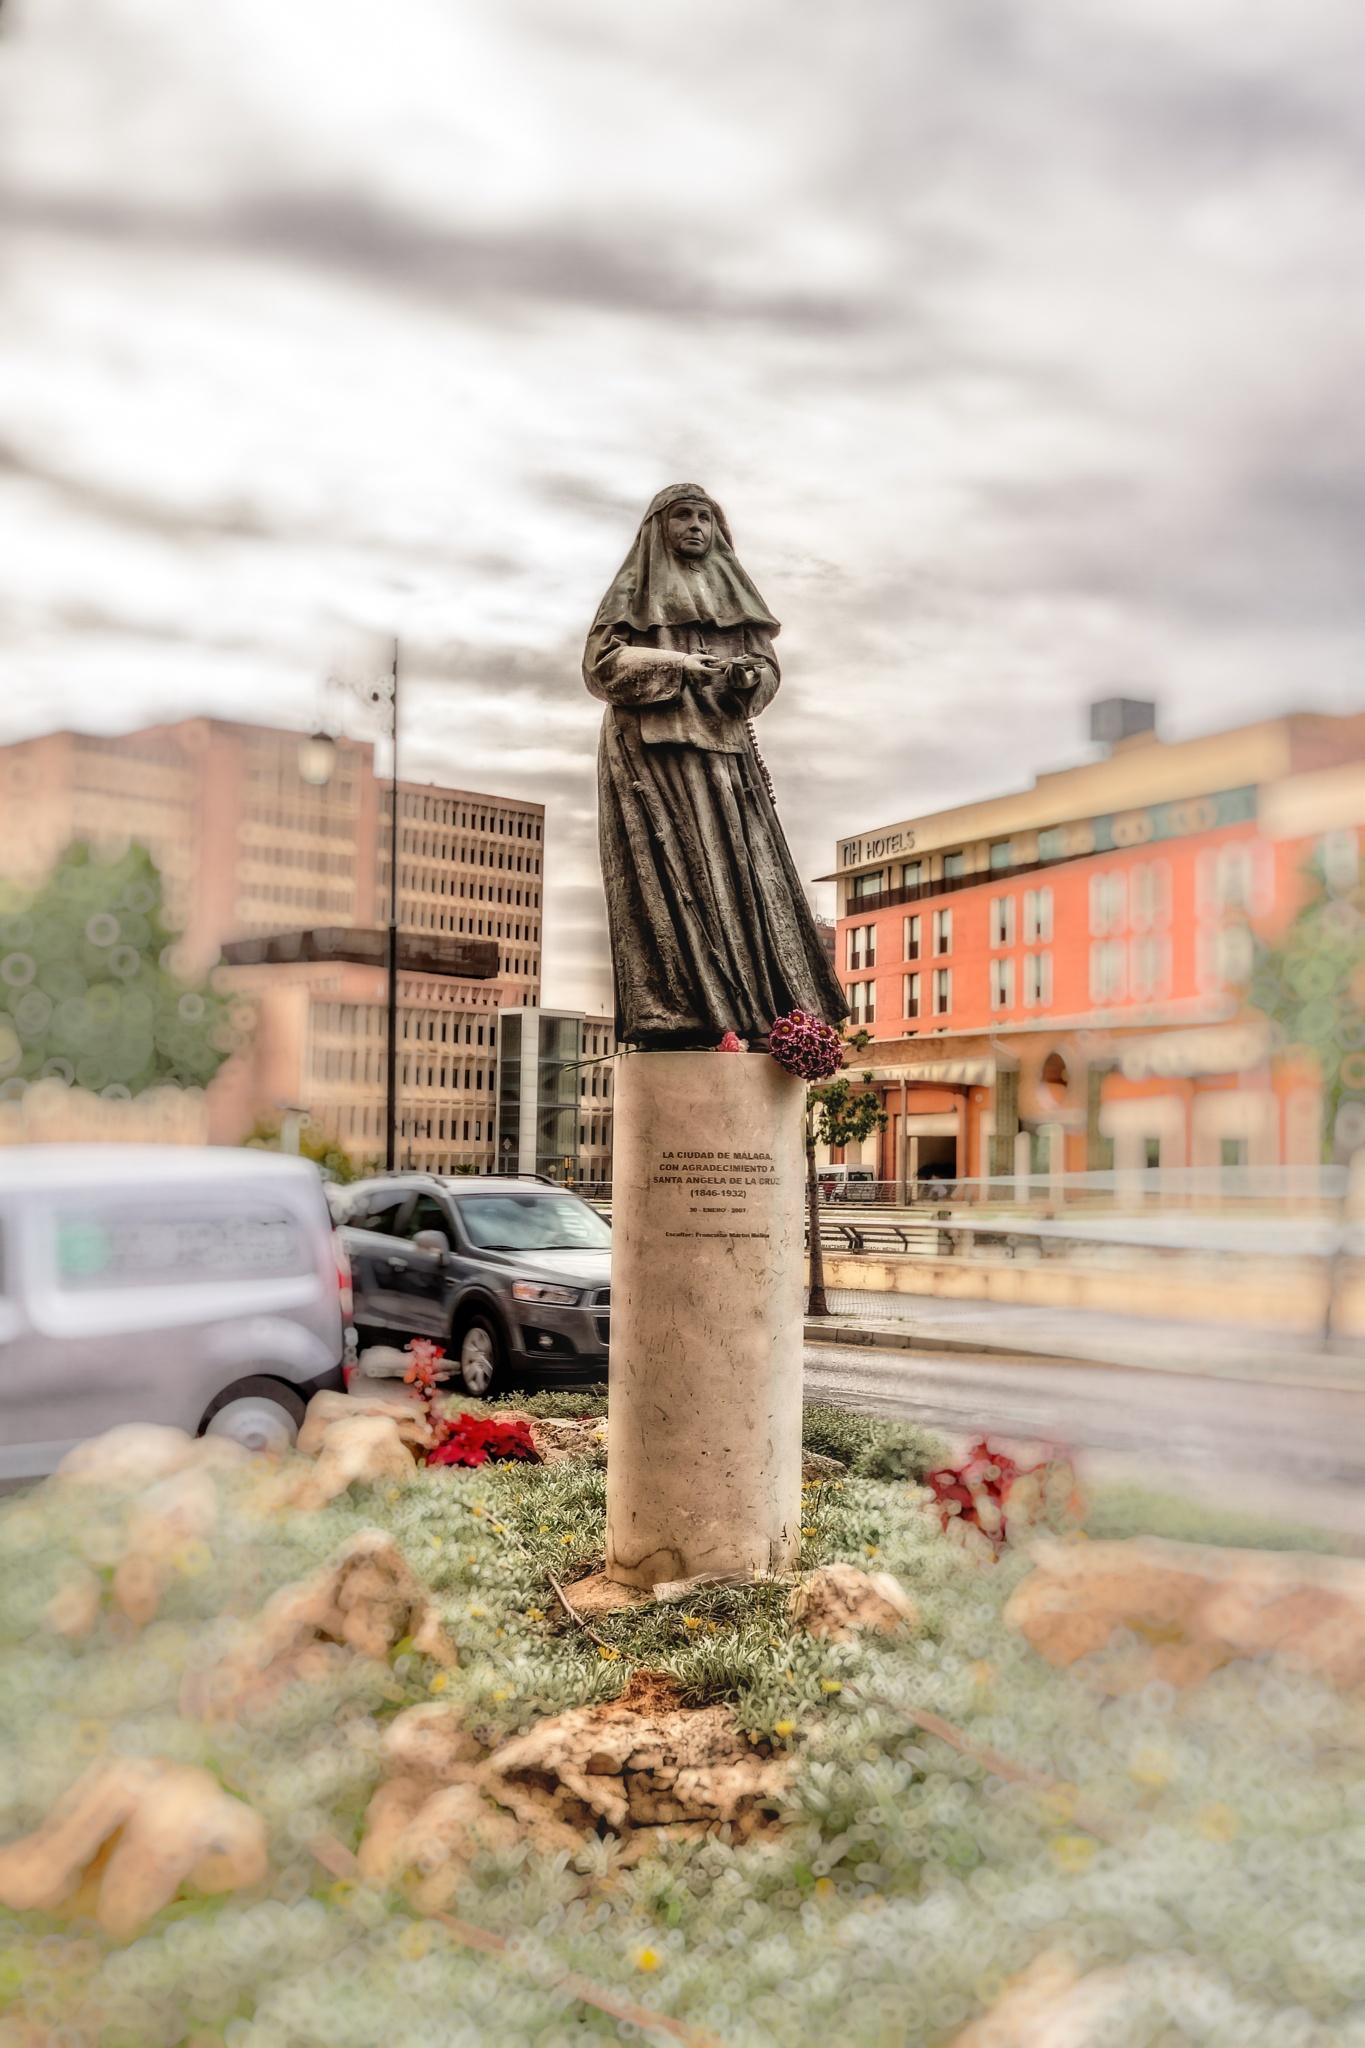 Spanish Nun by dbatten12